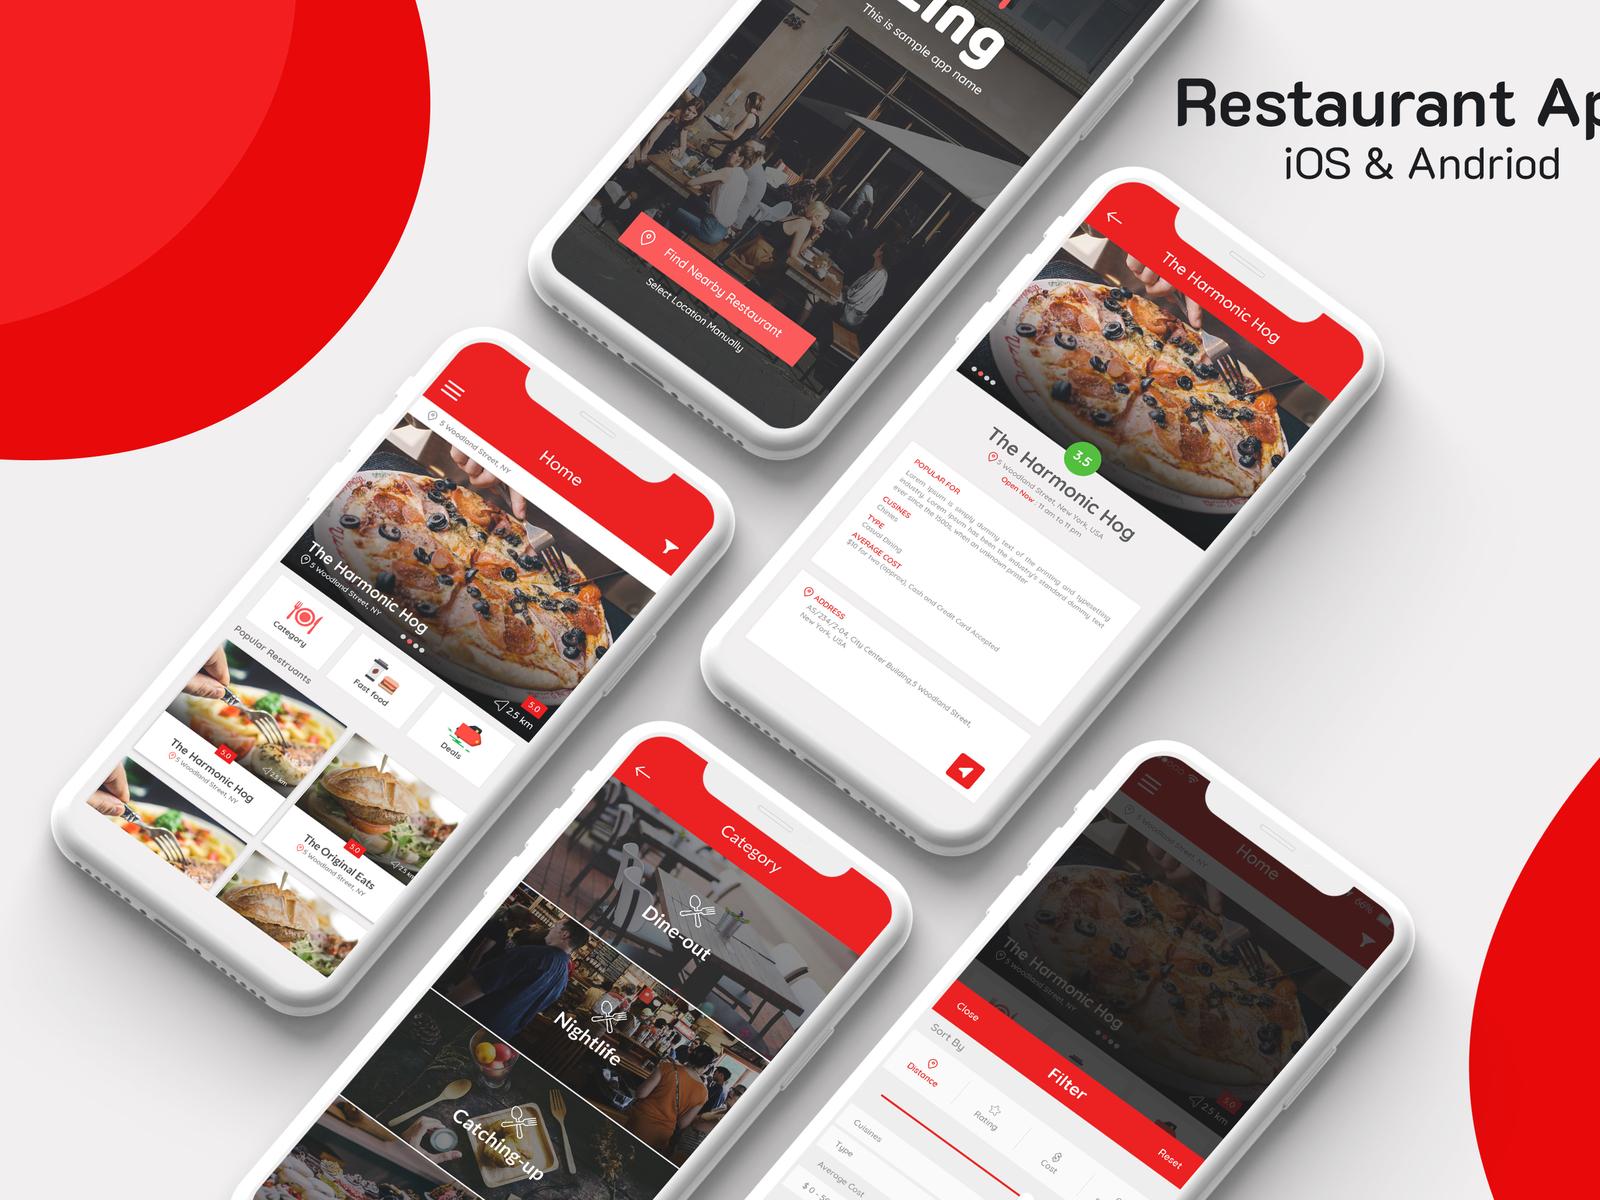 Restaurant app 4x